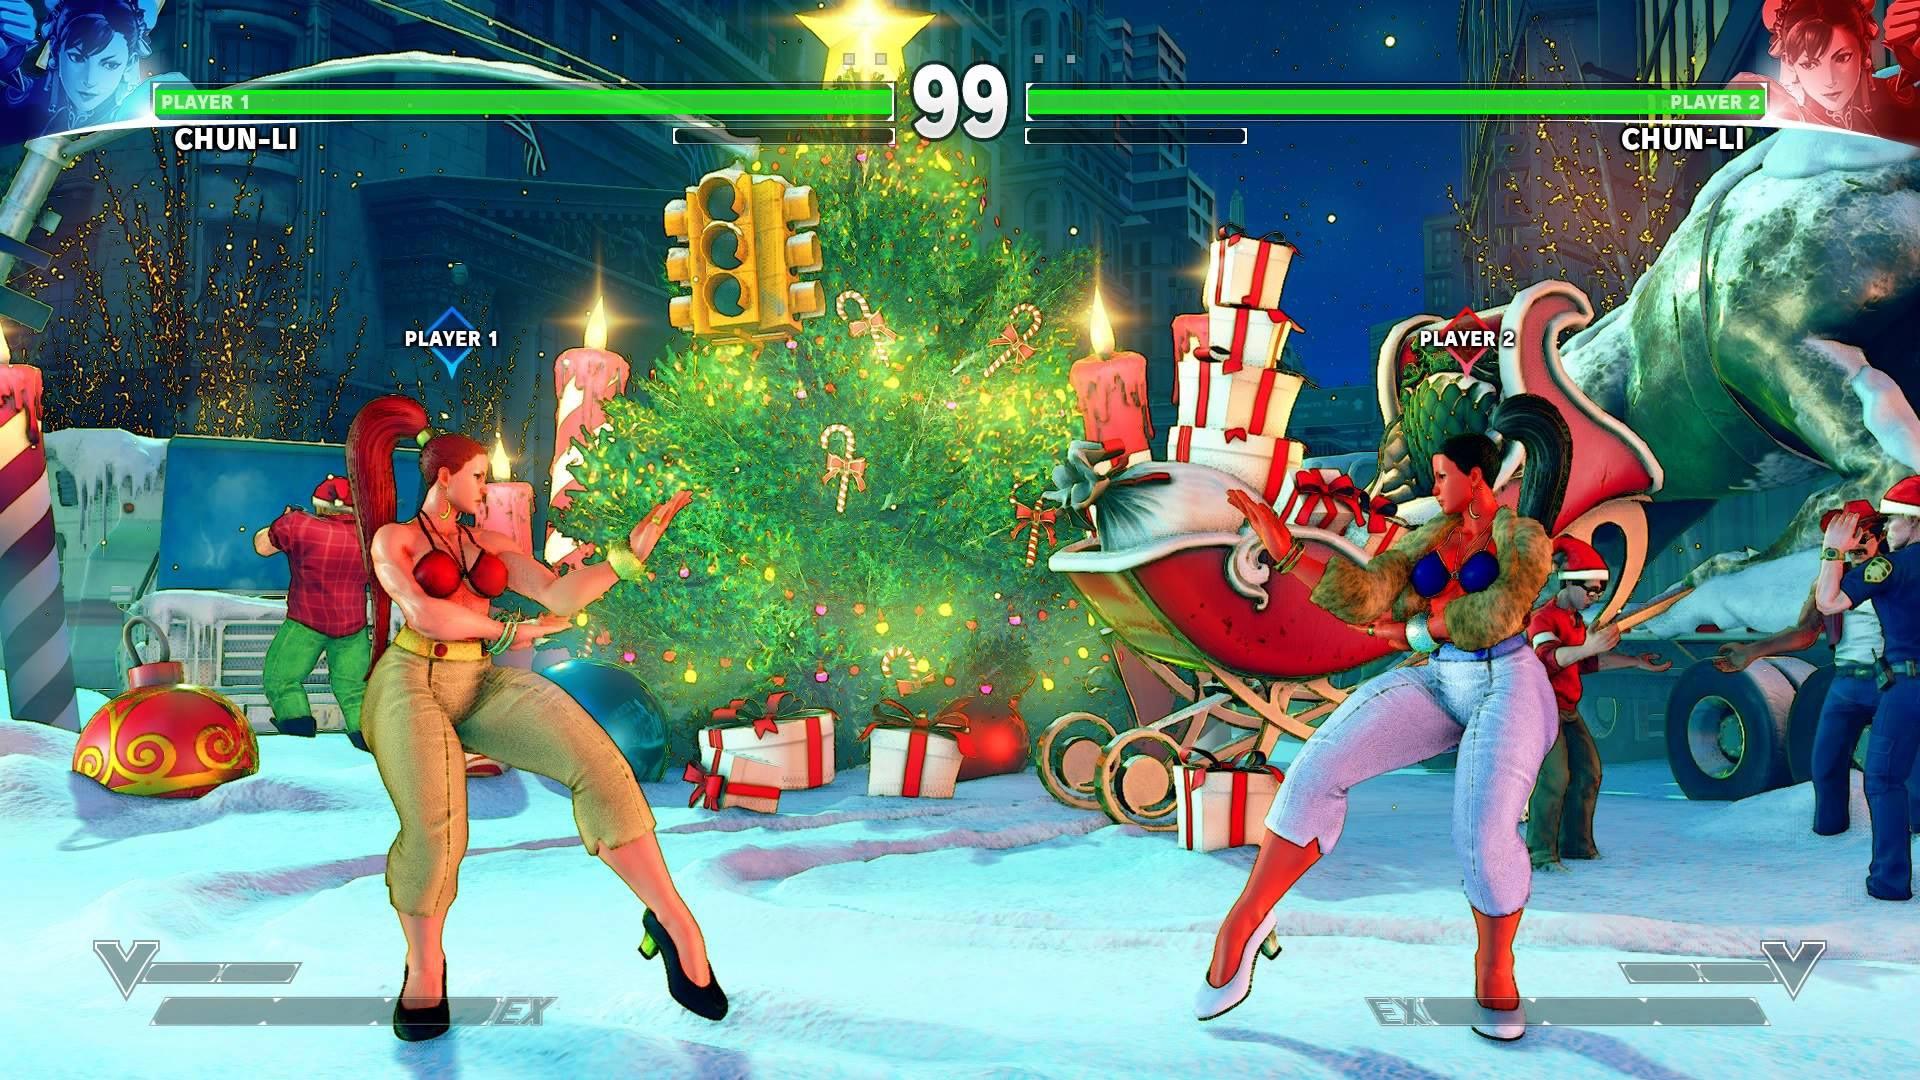 Chun-Li's Street Fighter 5 wardrobe 5 out of 13 image gallery